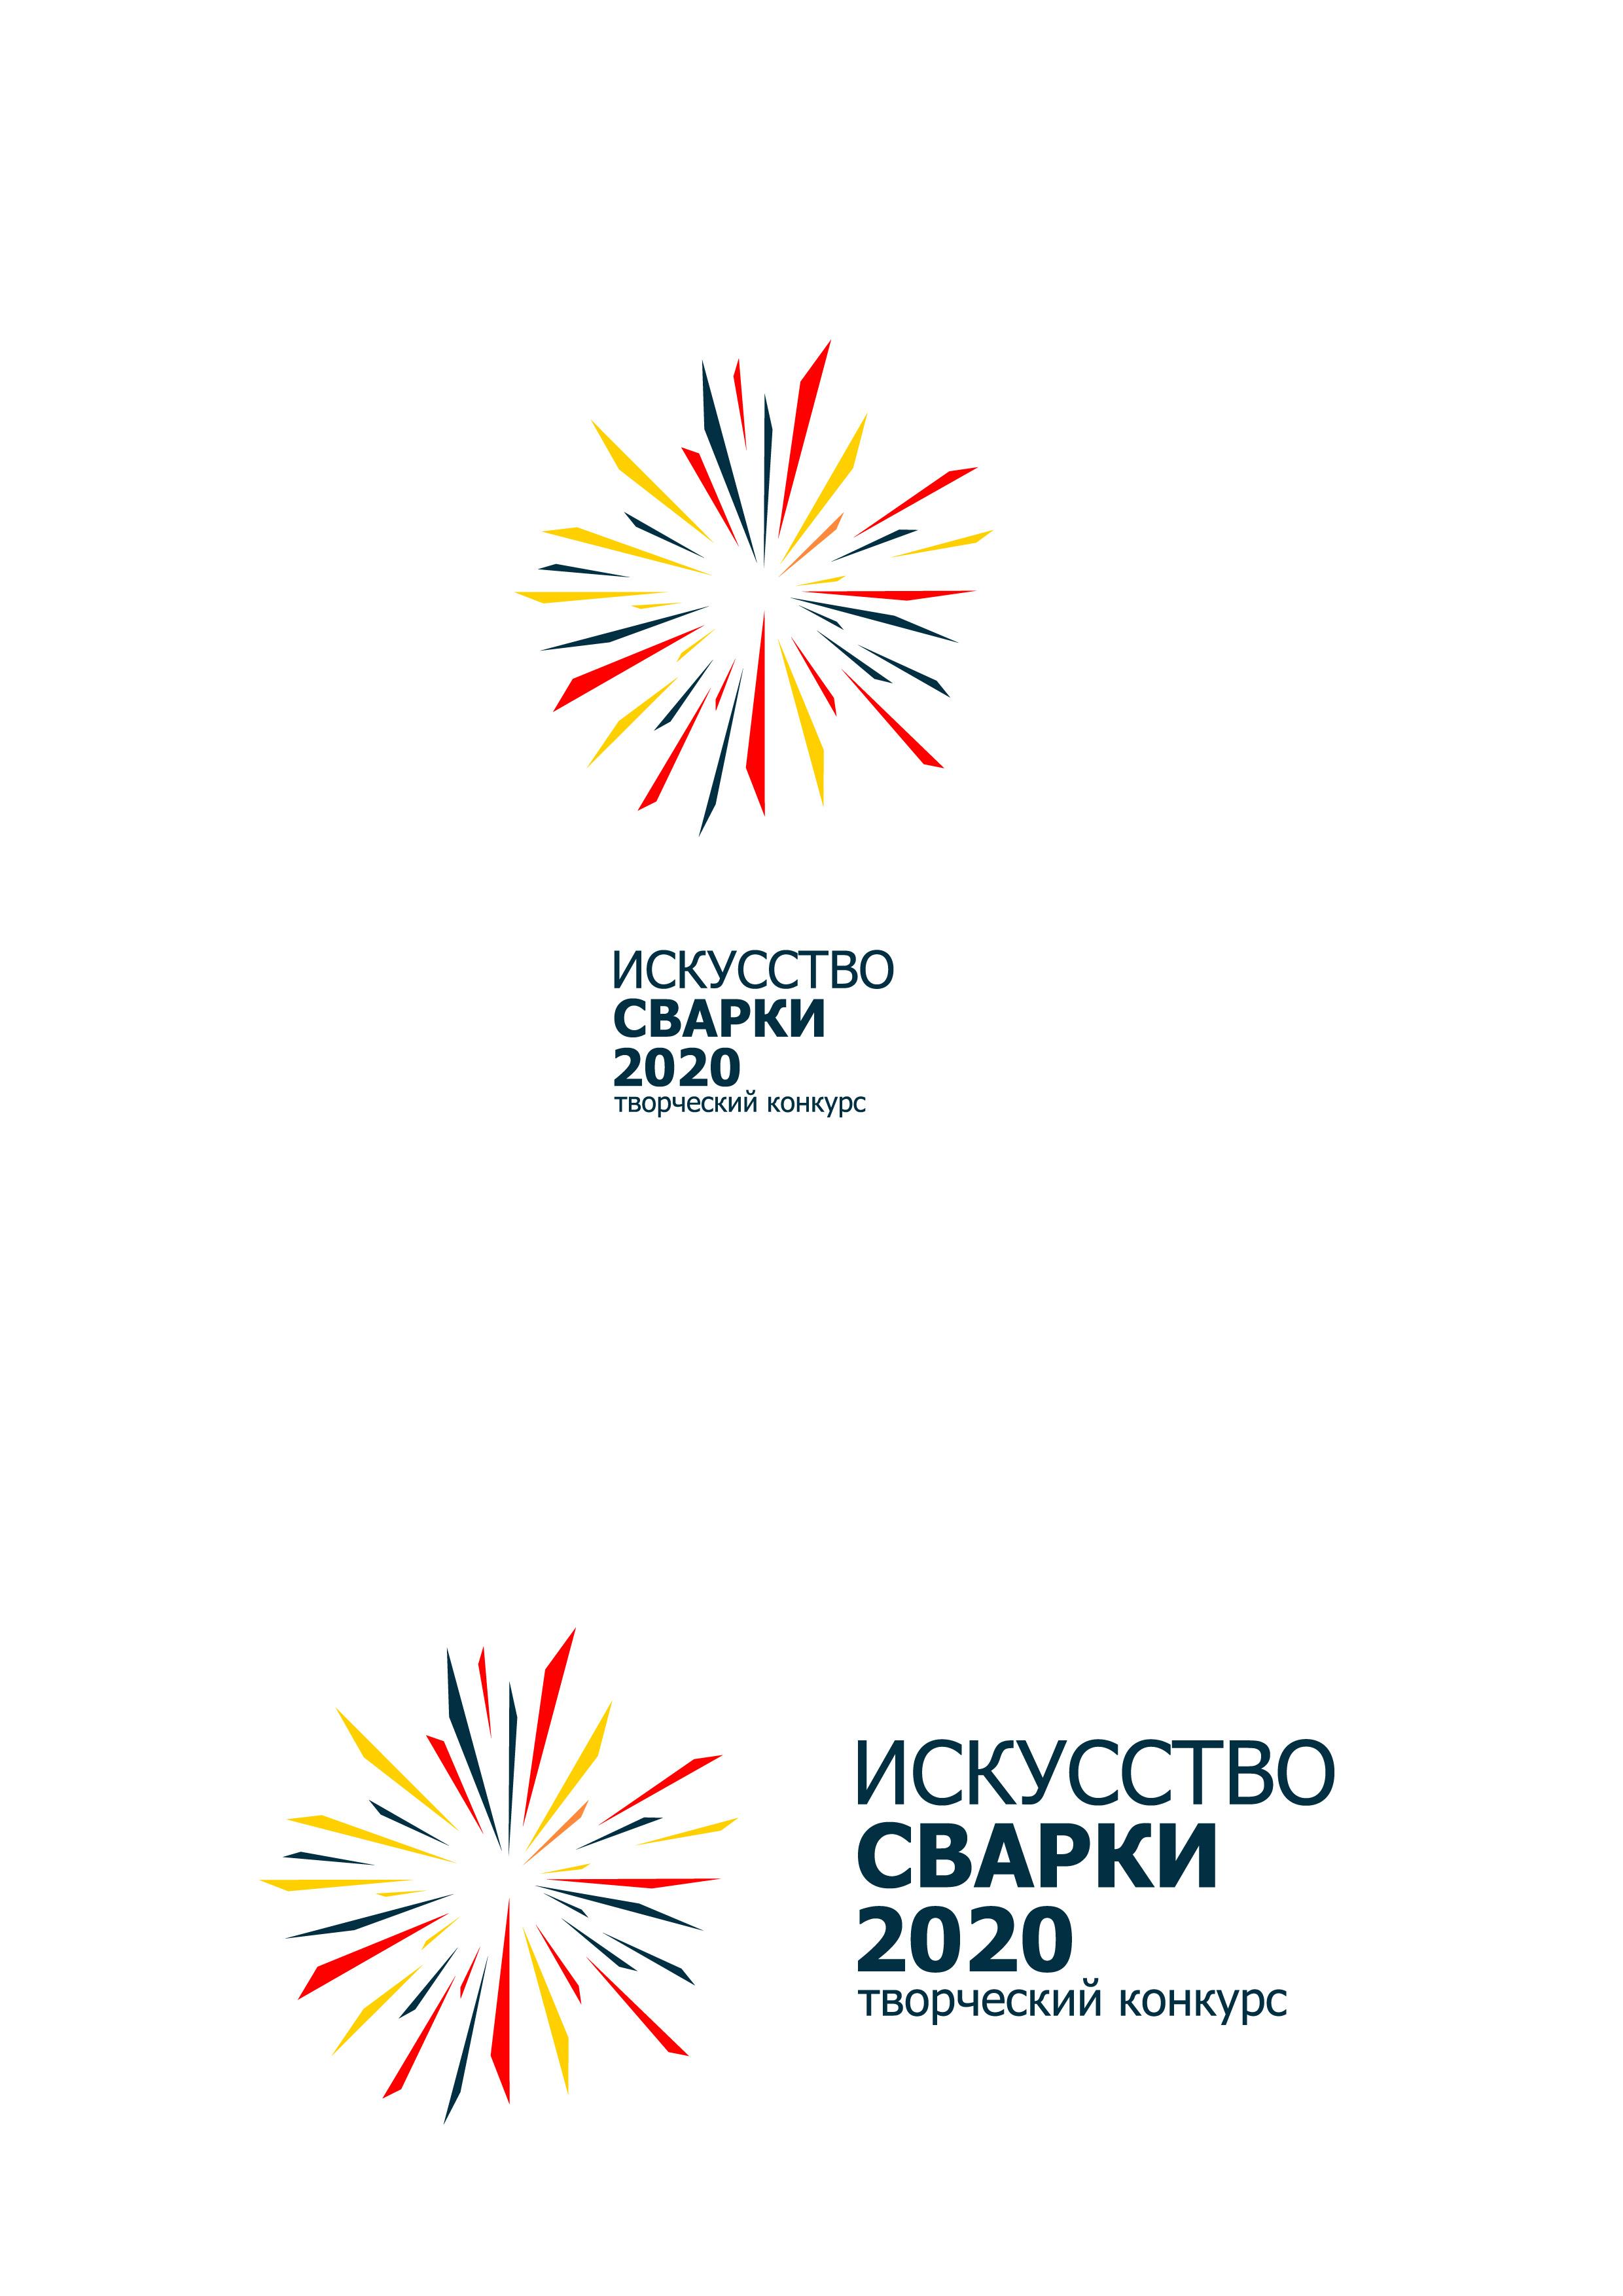 Разработка логотипа для Конкурса фото f_1245f6f53f594cfc.jpg